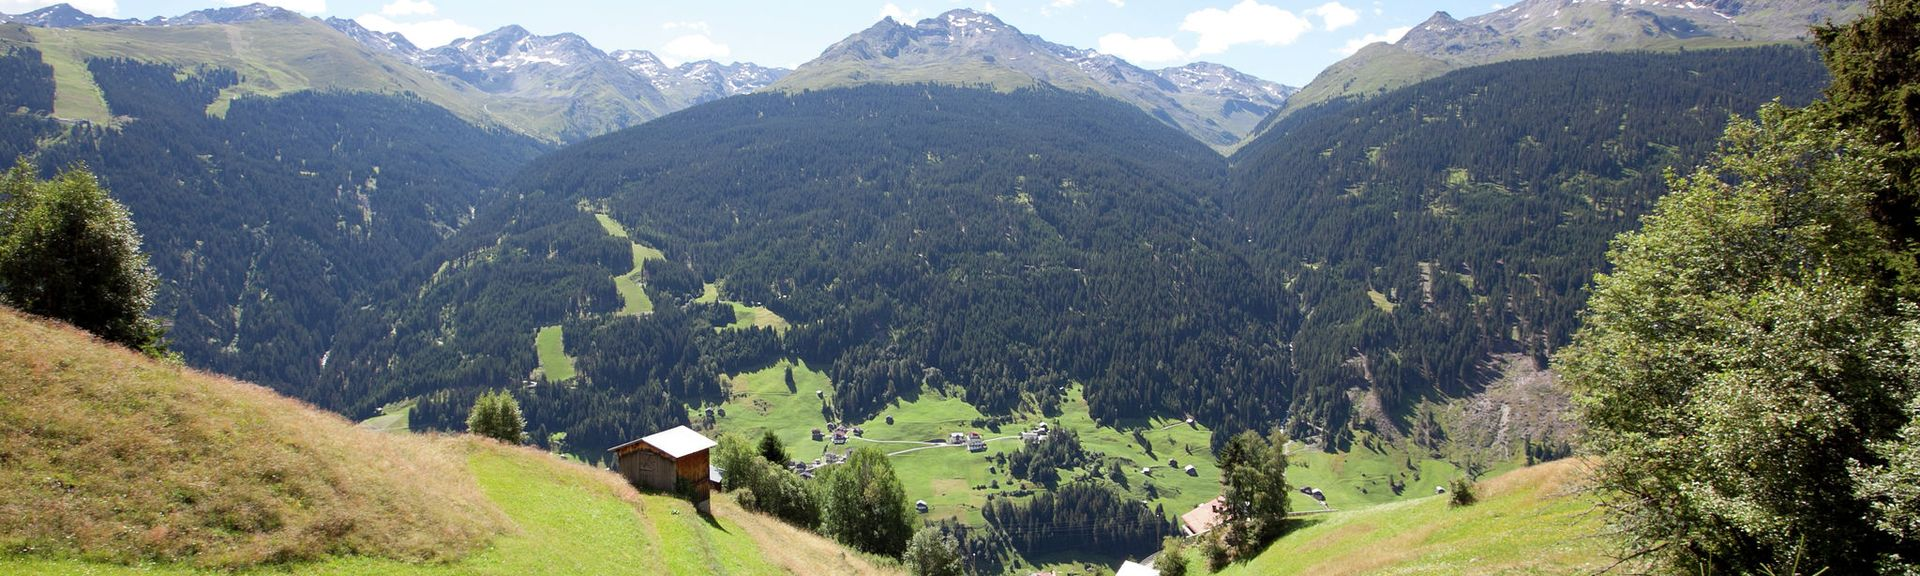 Ebene, Austria